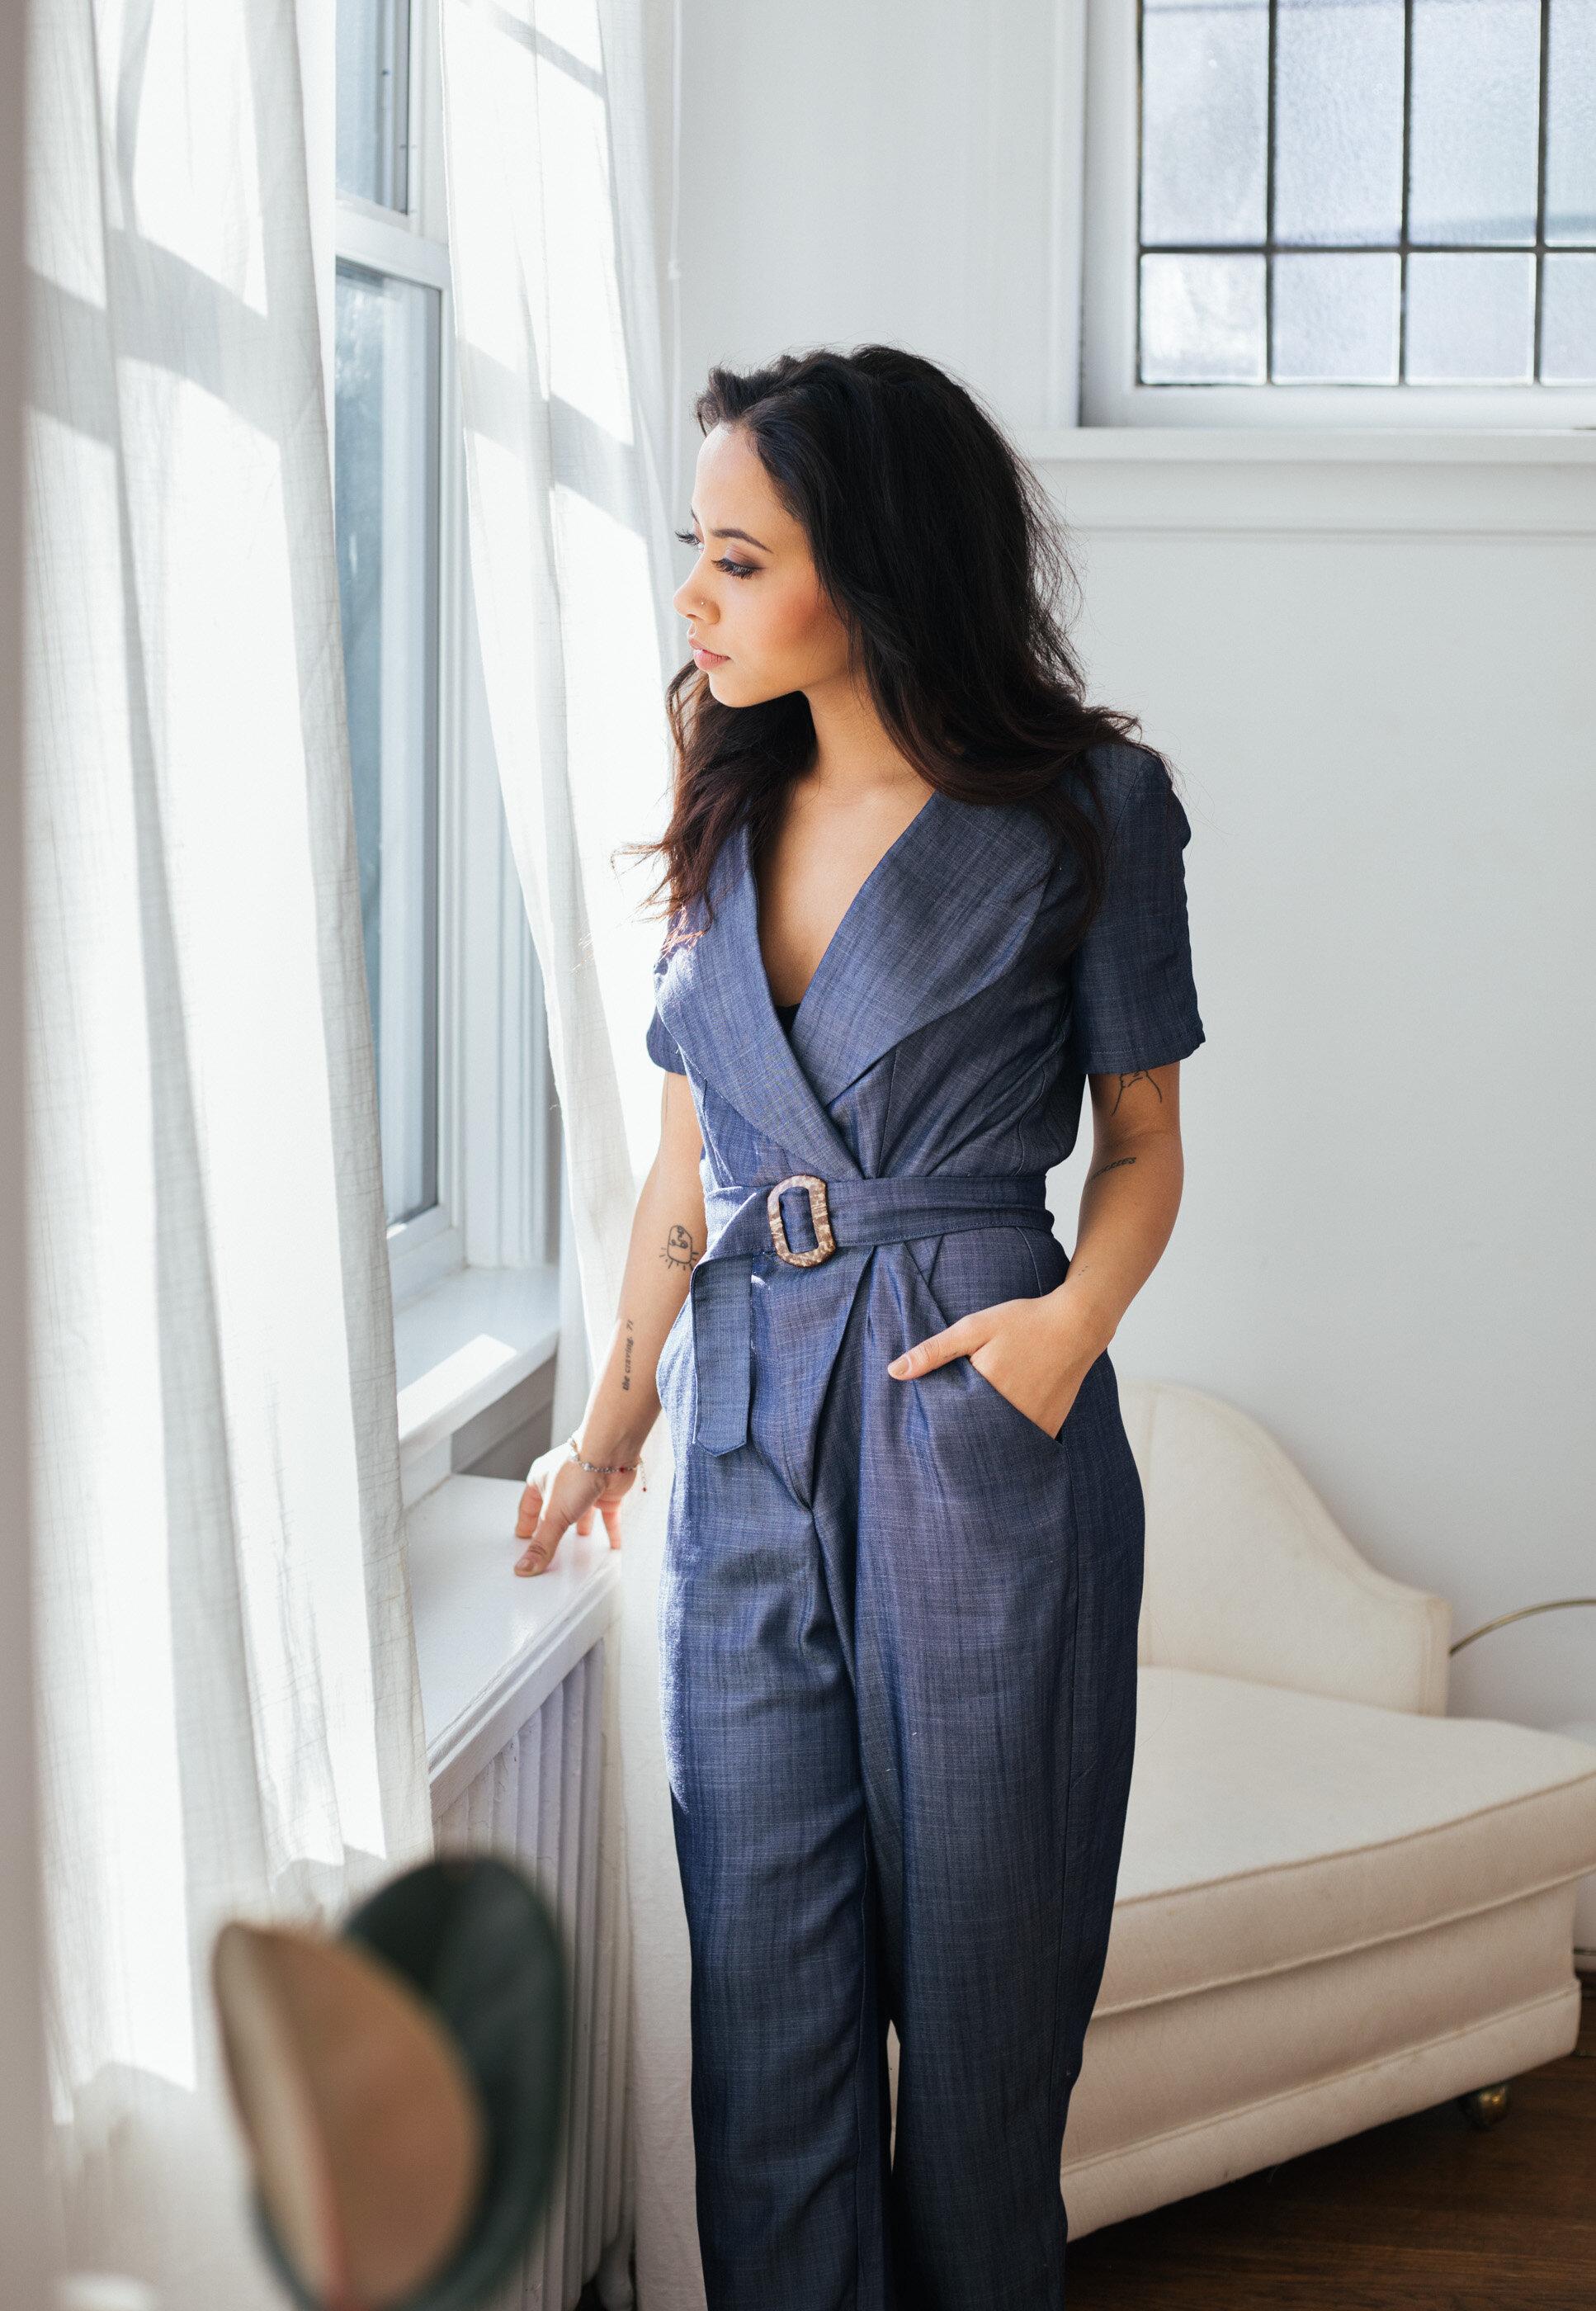 bellantoni-canadian-sustainable-fashion-brand tencel-jumper-pantsuit-trend.jpg